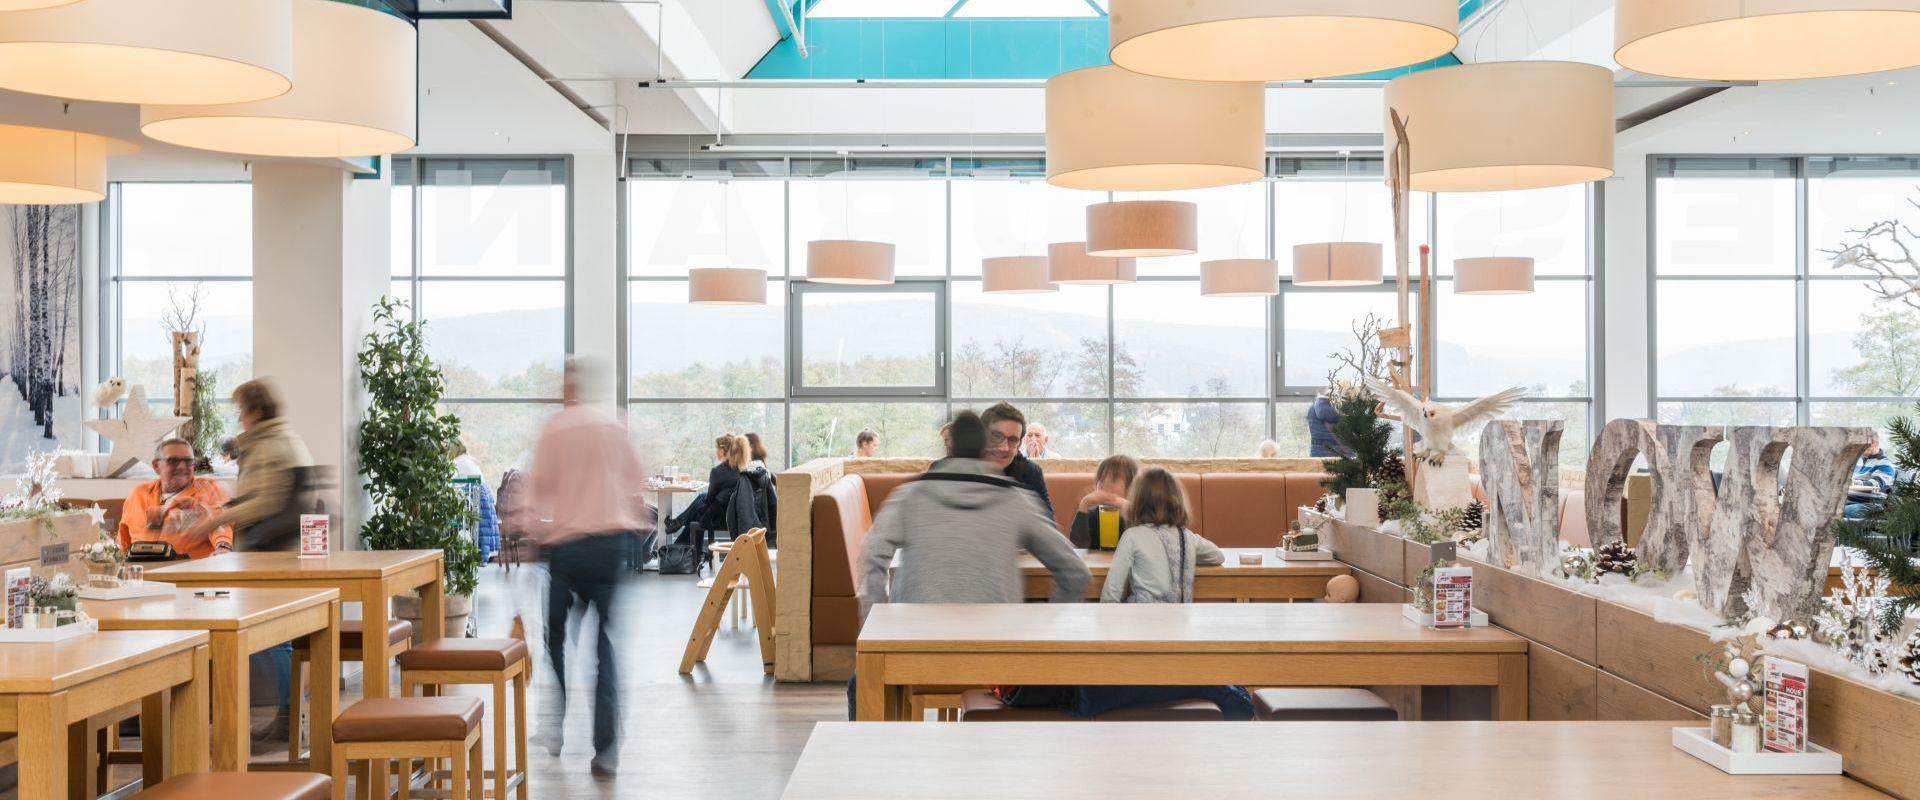 Restaurant Mit Panorama Blick Spilgerde